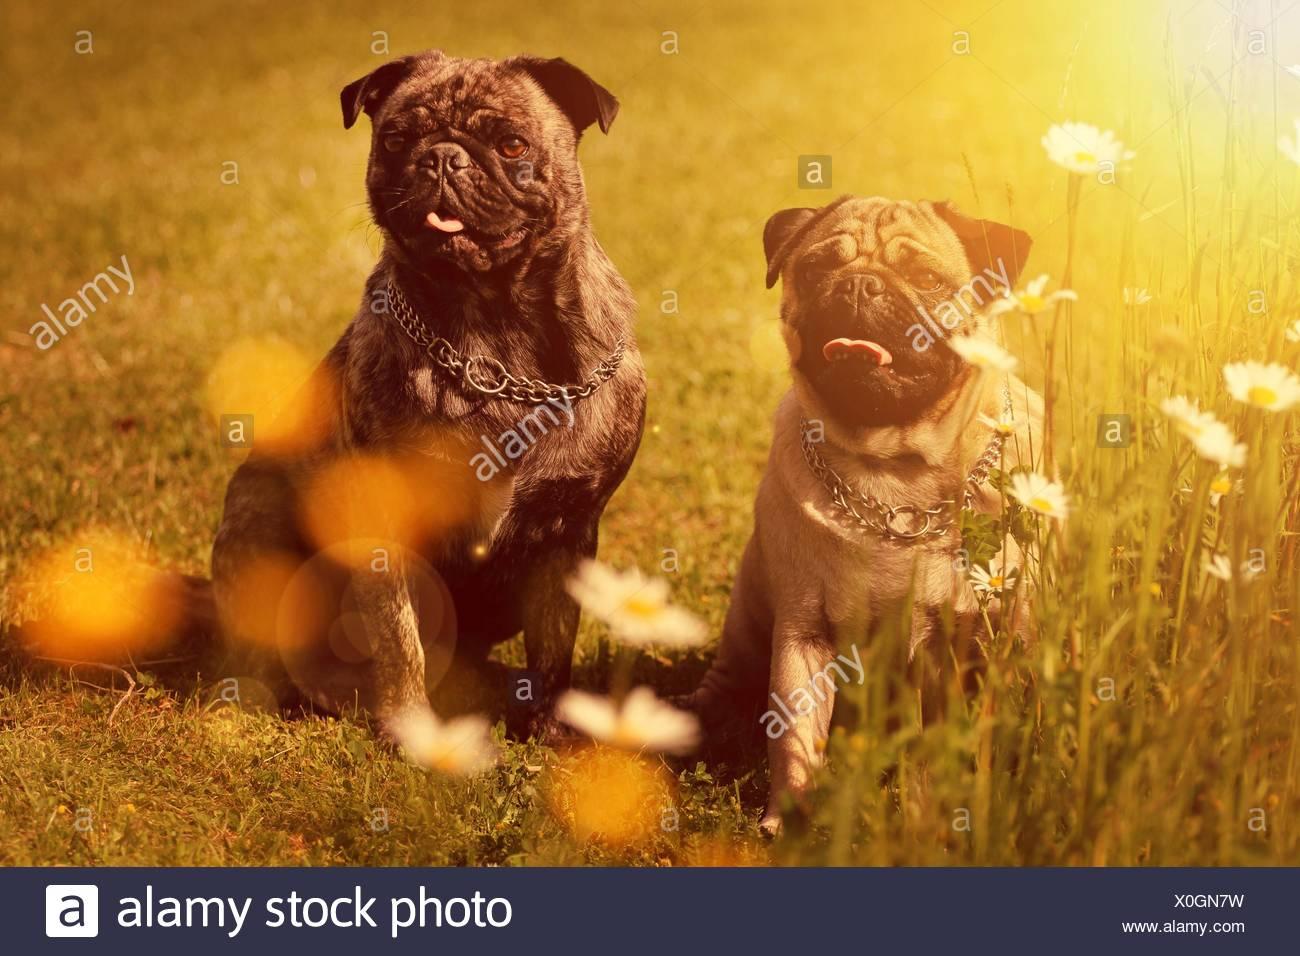 2 Pugs - Stock Image